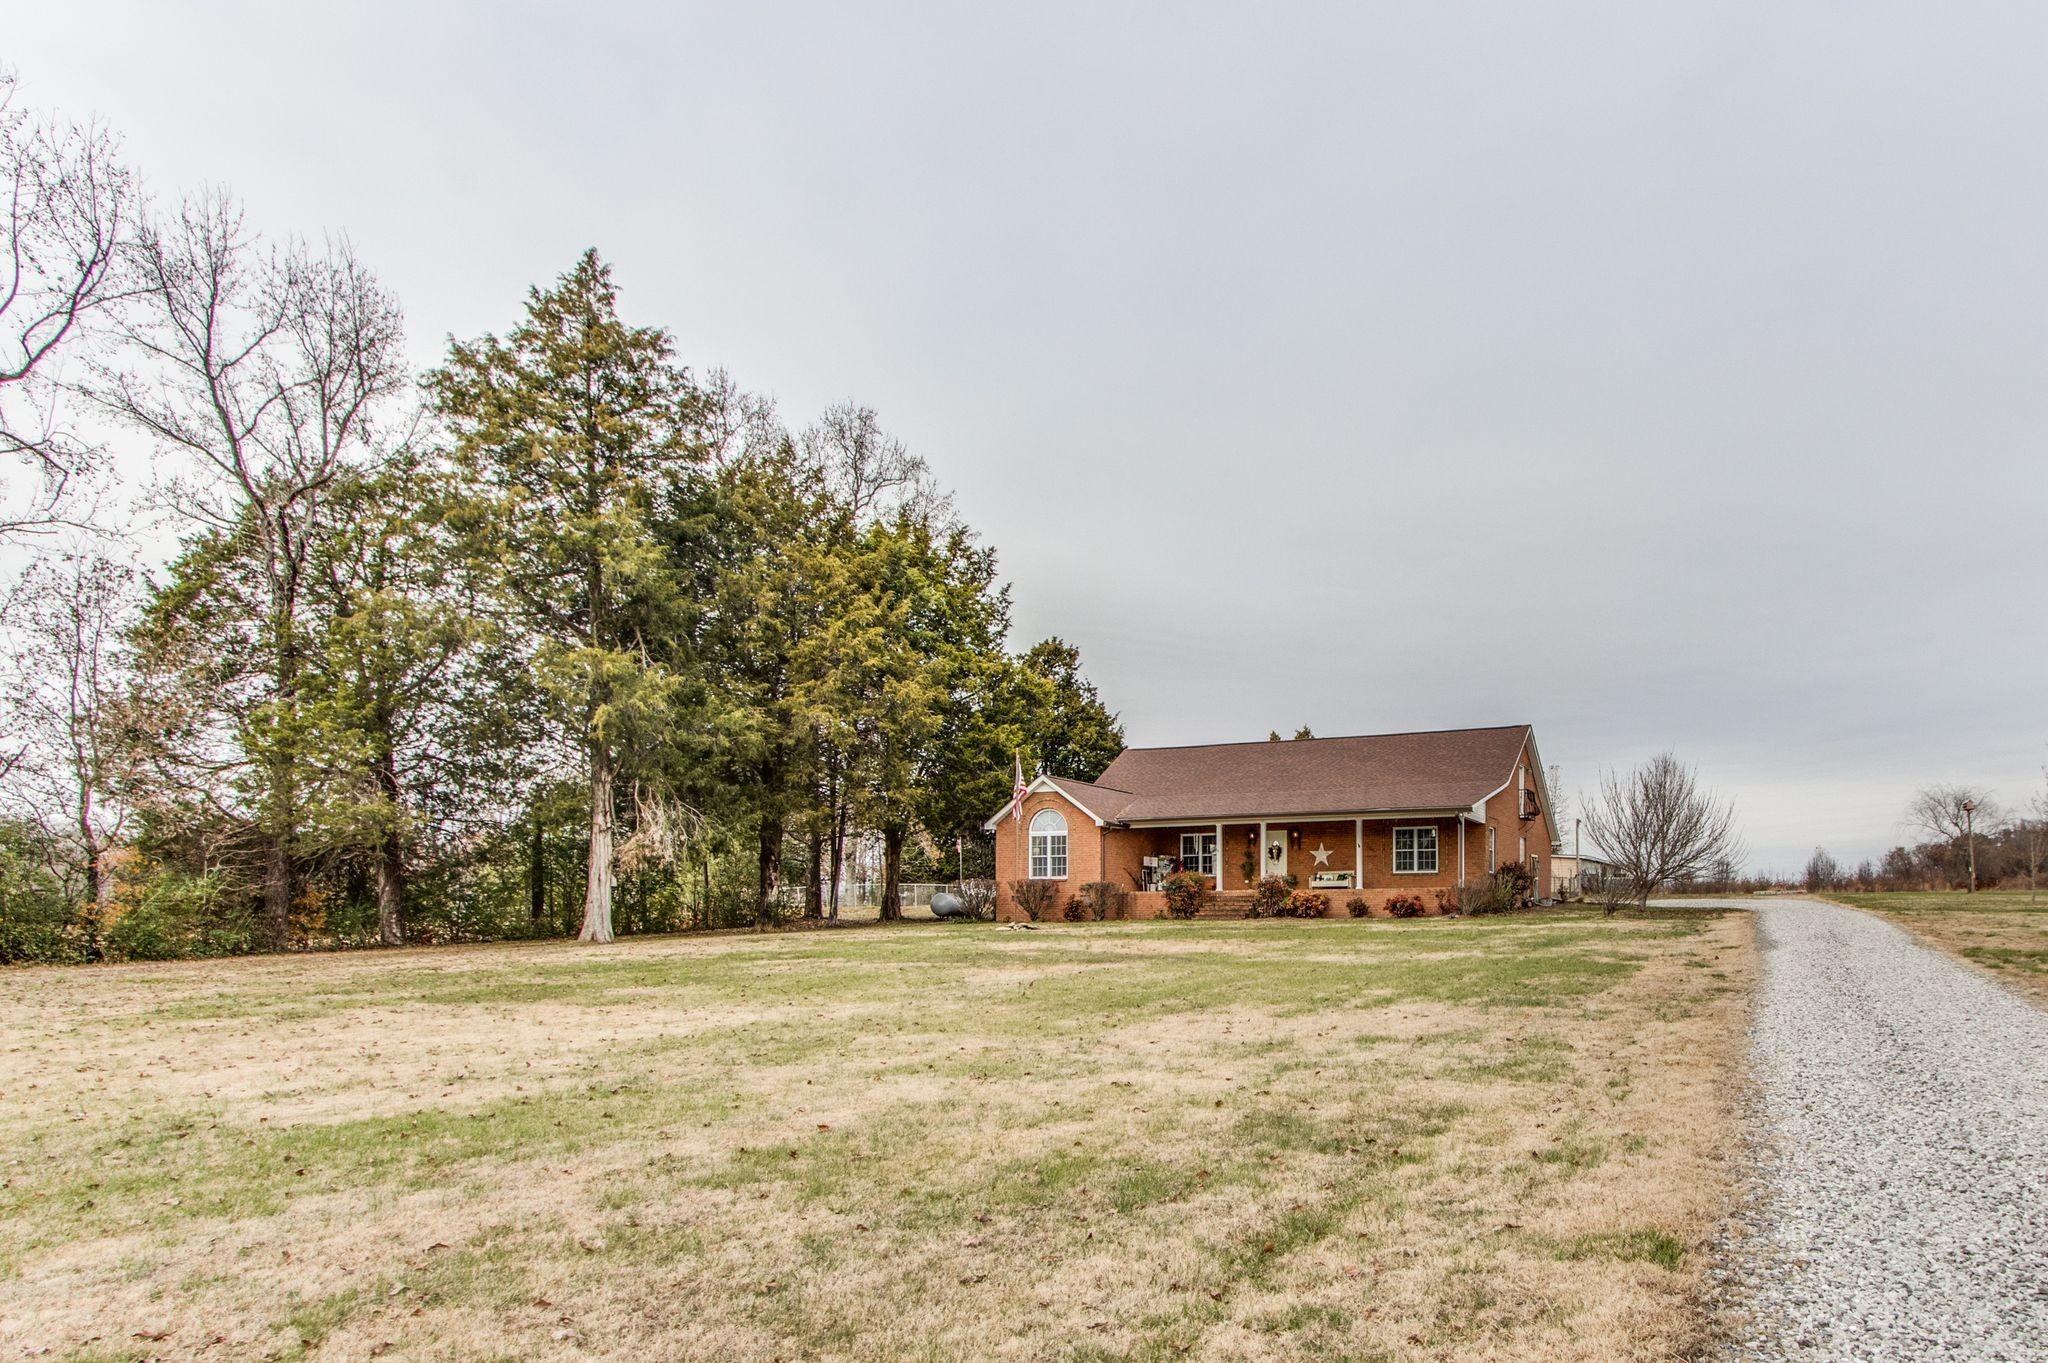 2073 Pocahontas Rd, Morrison, TN 37357 - Morrison, TN real estate listing